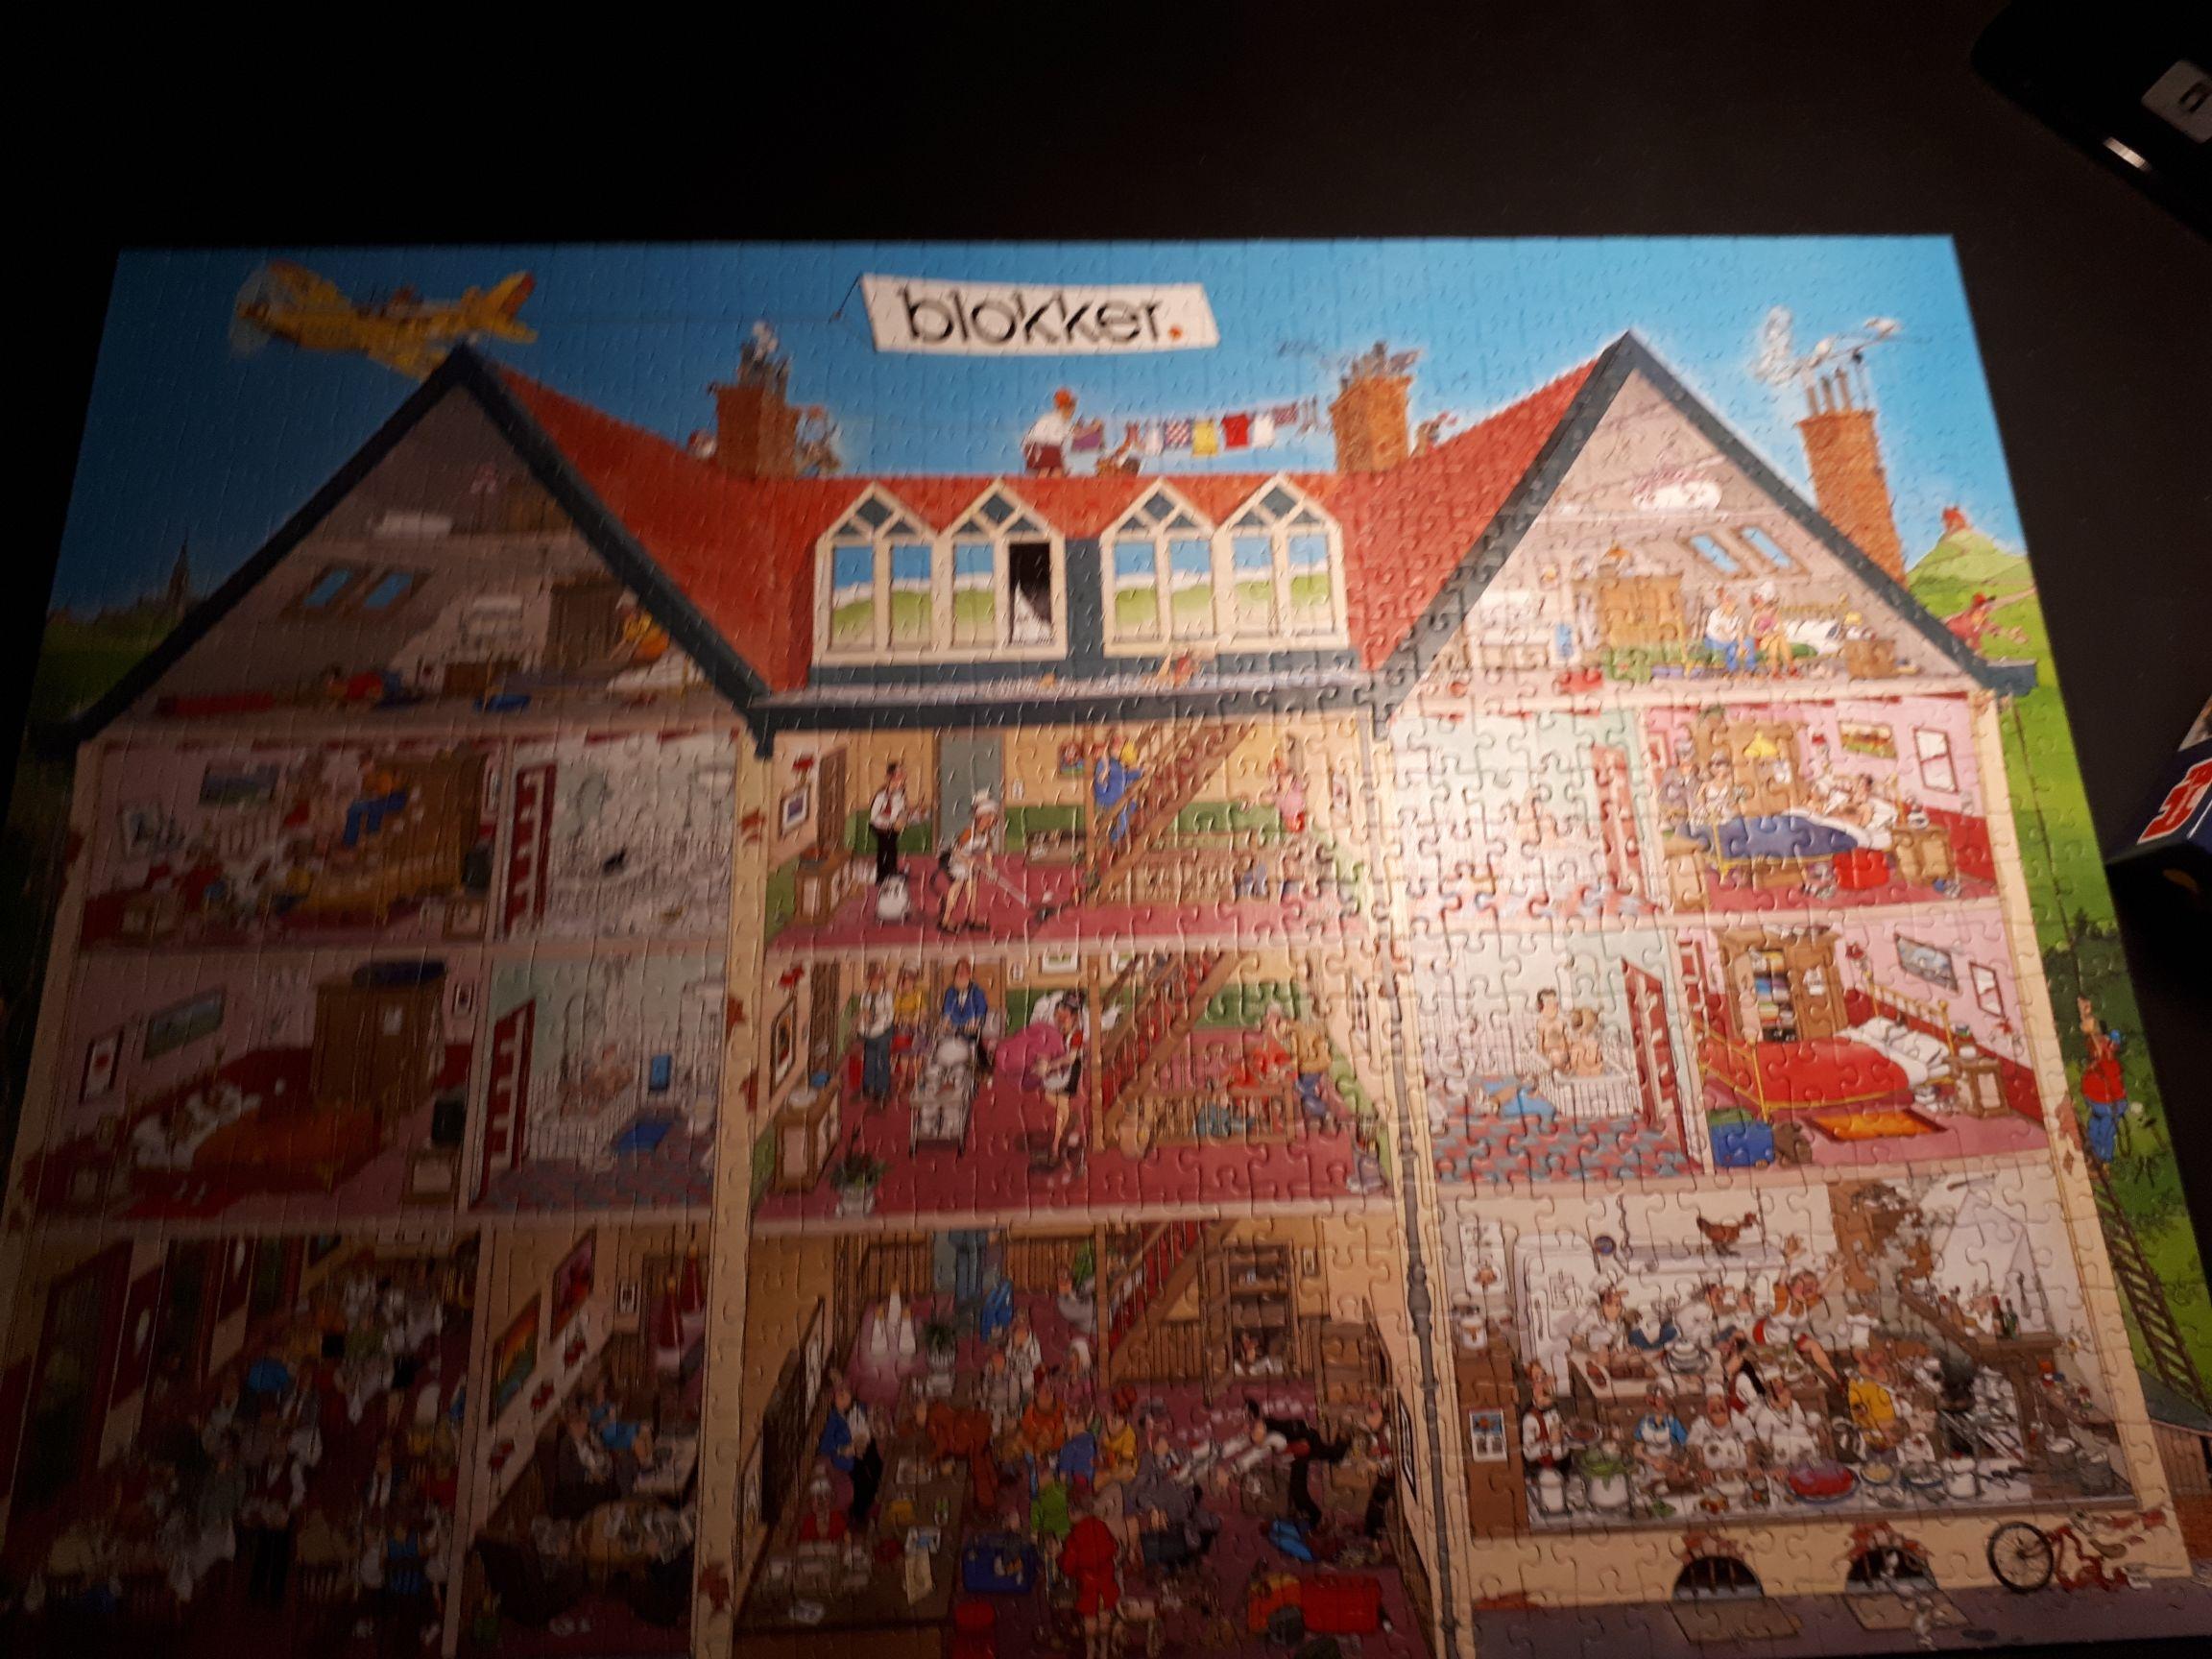 Het Hotel Blokker Special 81636 Puzzle - Jumbo (-) back image (back cover, second image)